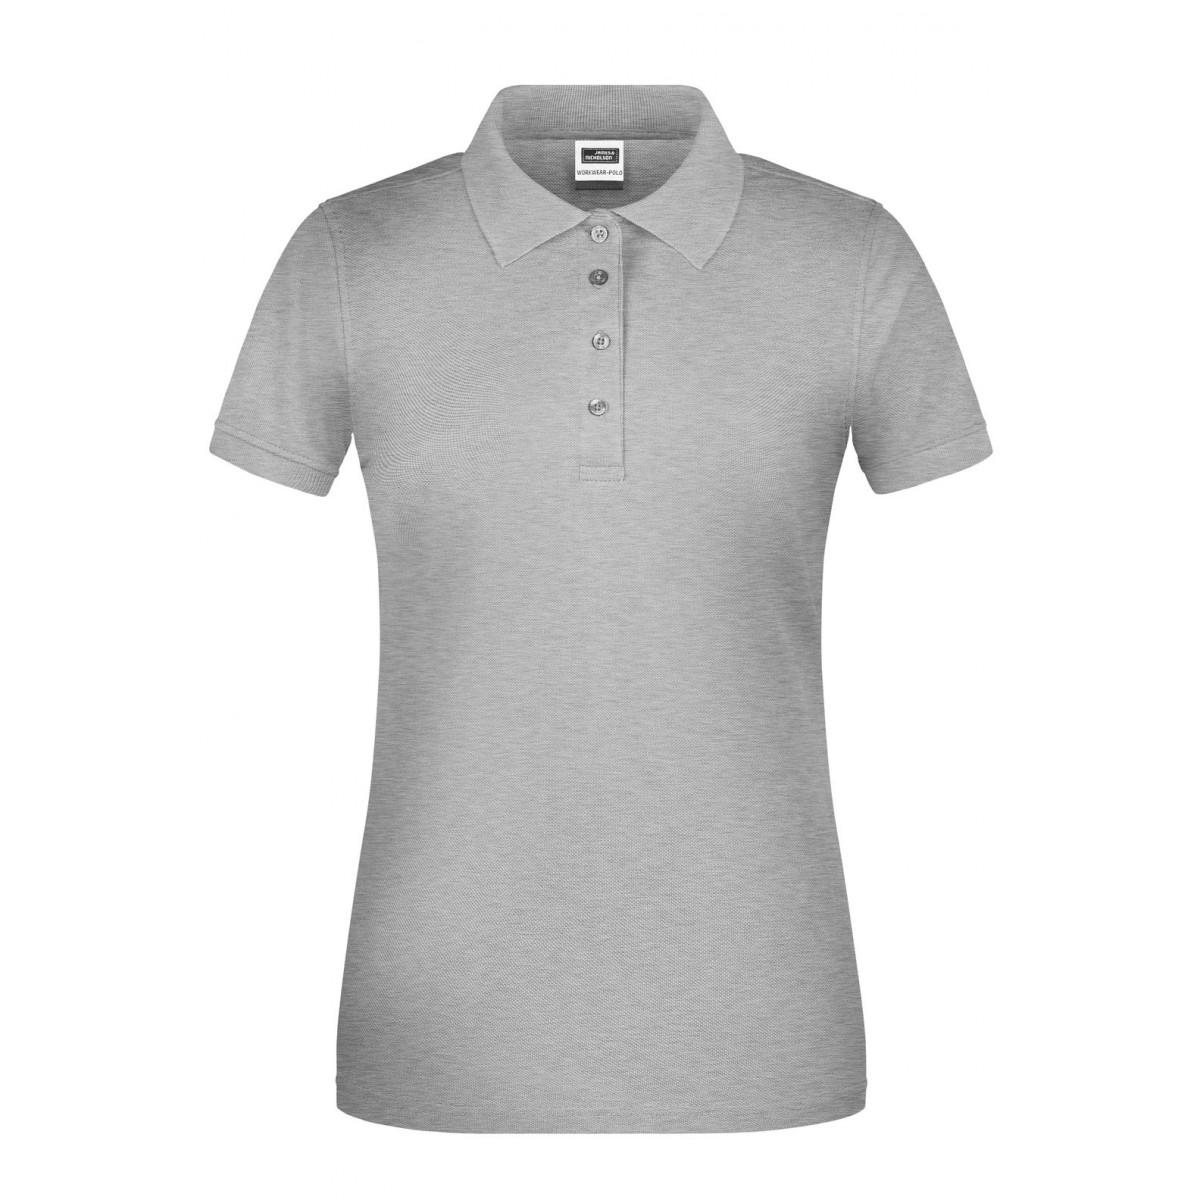 Рубашка поло женская JN873 Ladies BIO Workwear Polo - Серый меланж